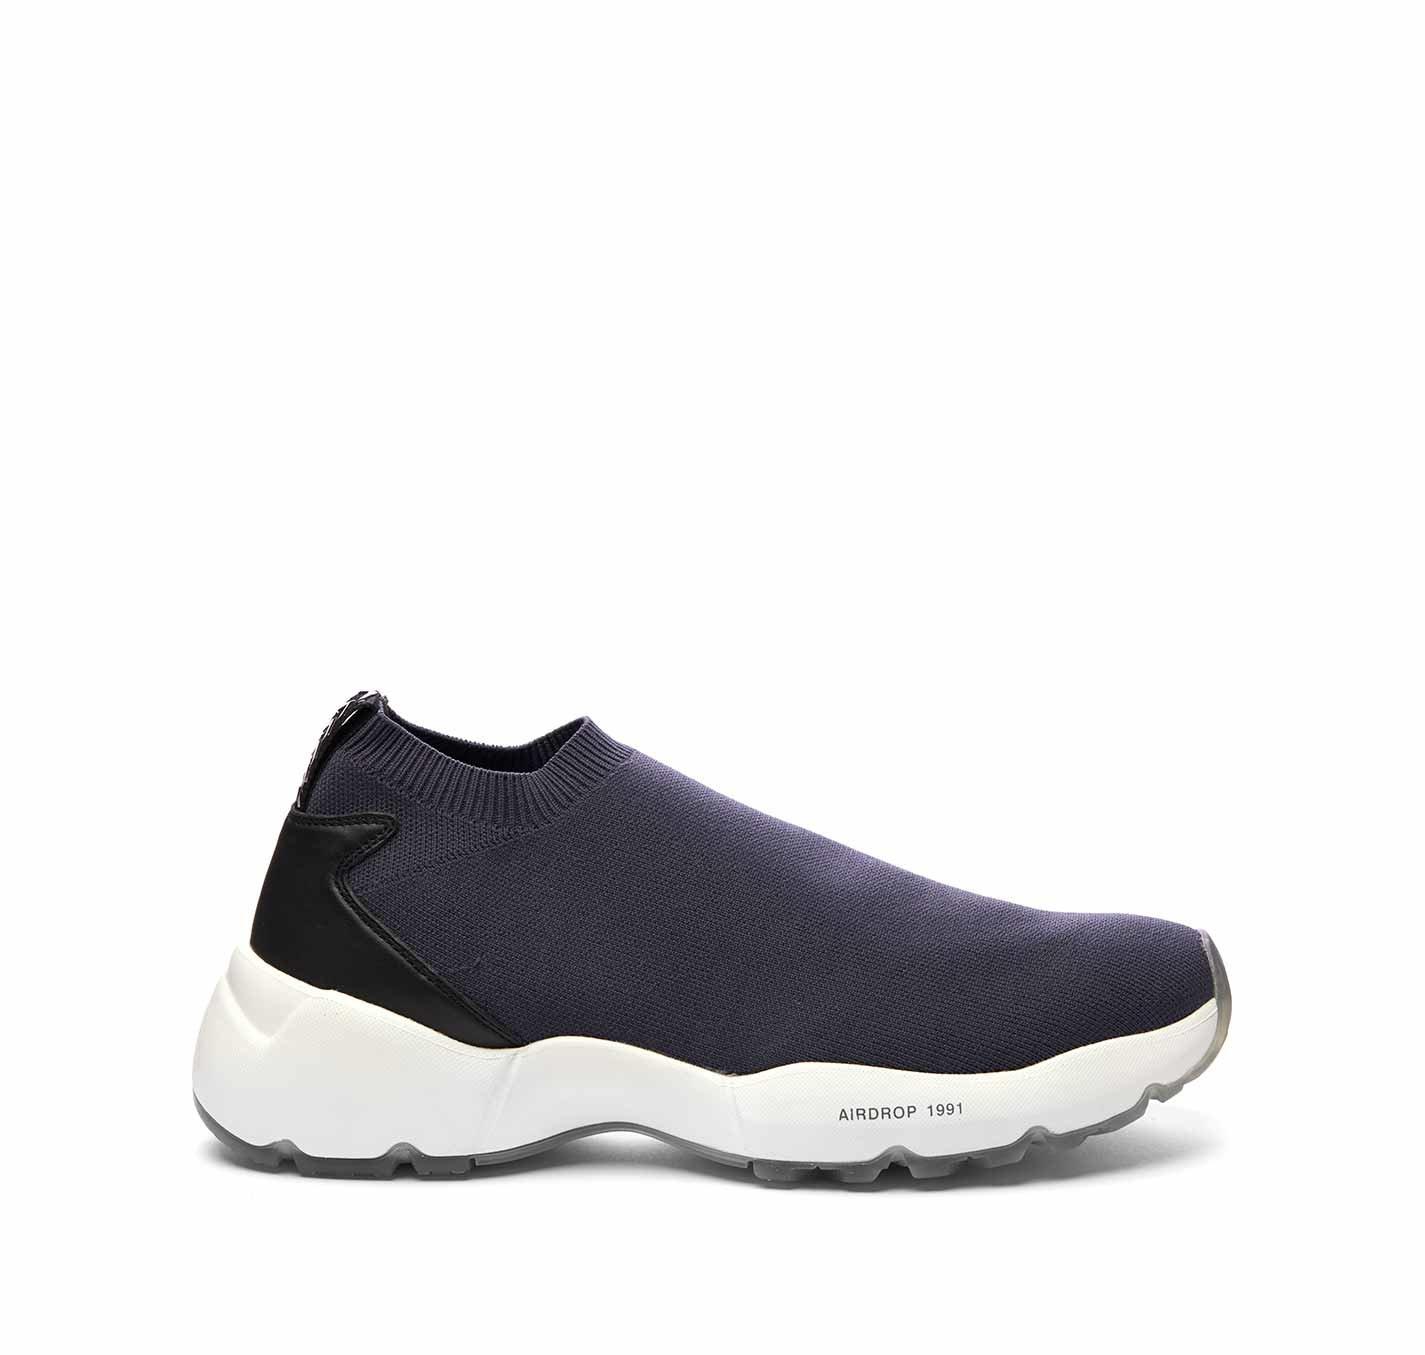 Running Sock Airdrop Low Cut Blu - Blu Bianco oxs neri Da corsa Sc8tQey2dG